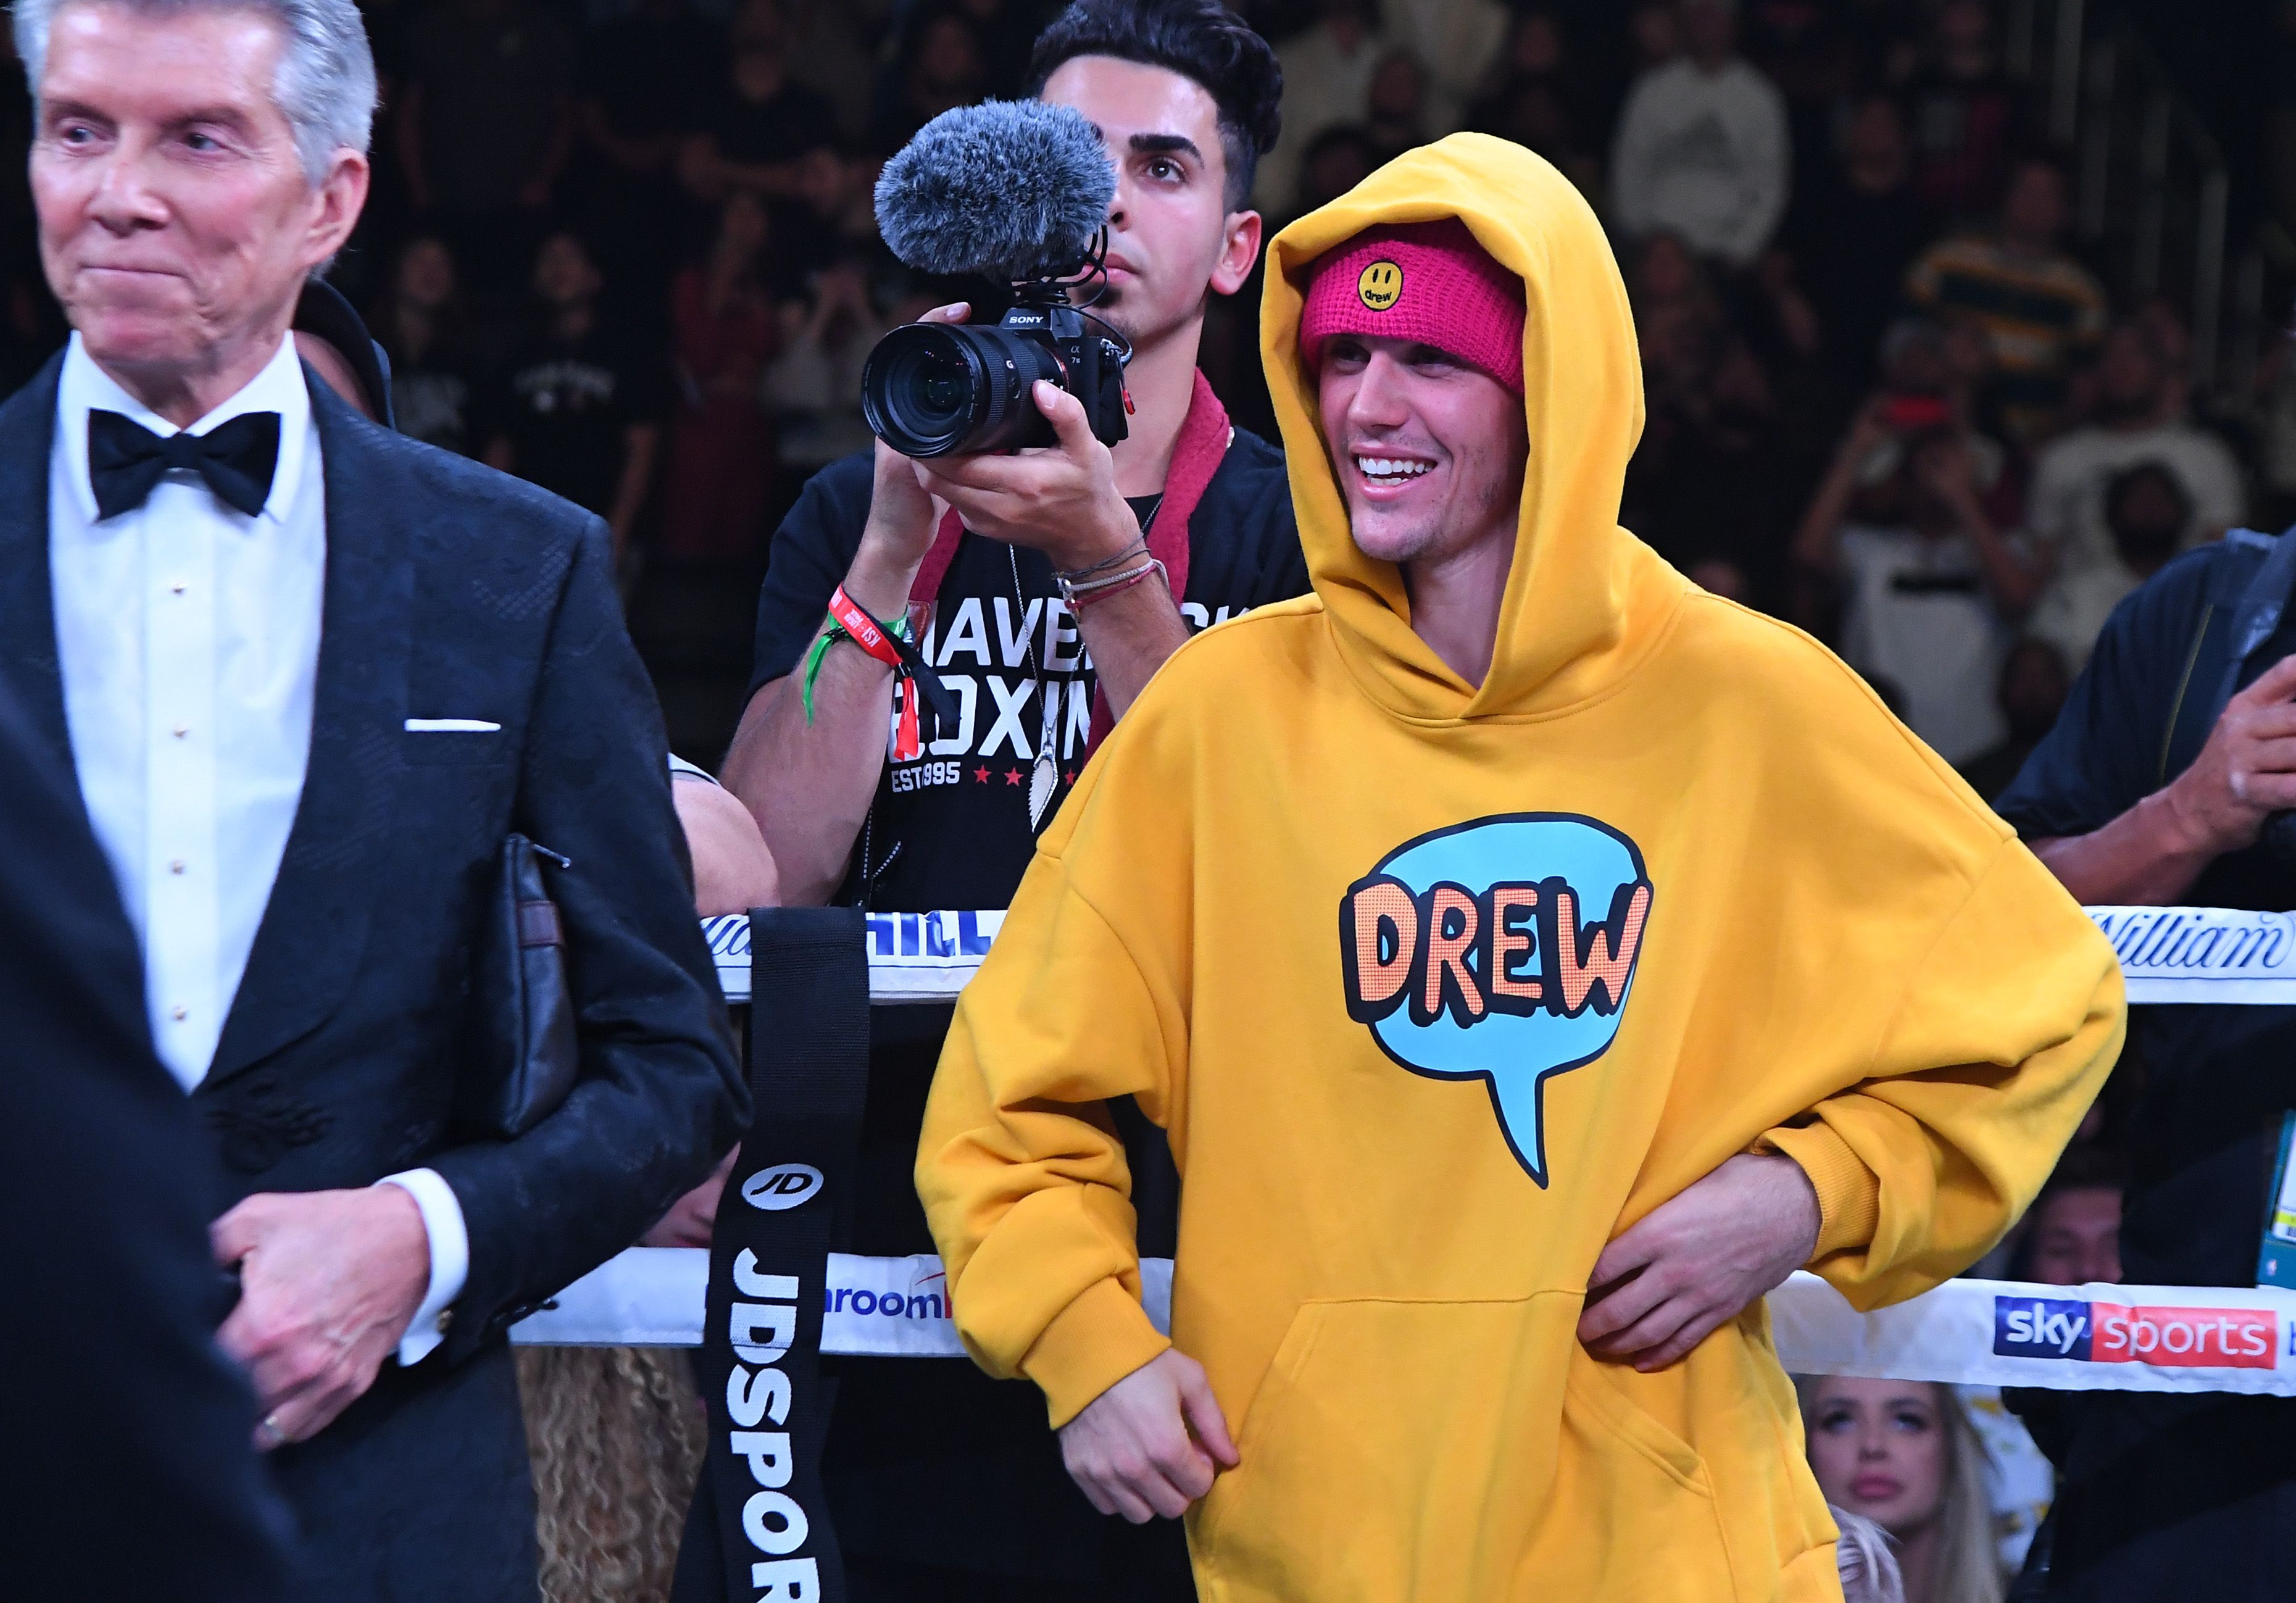 Justin Bieber wearing a yellow sweatshirt.